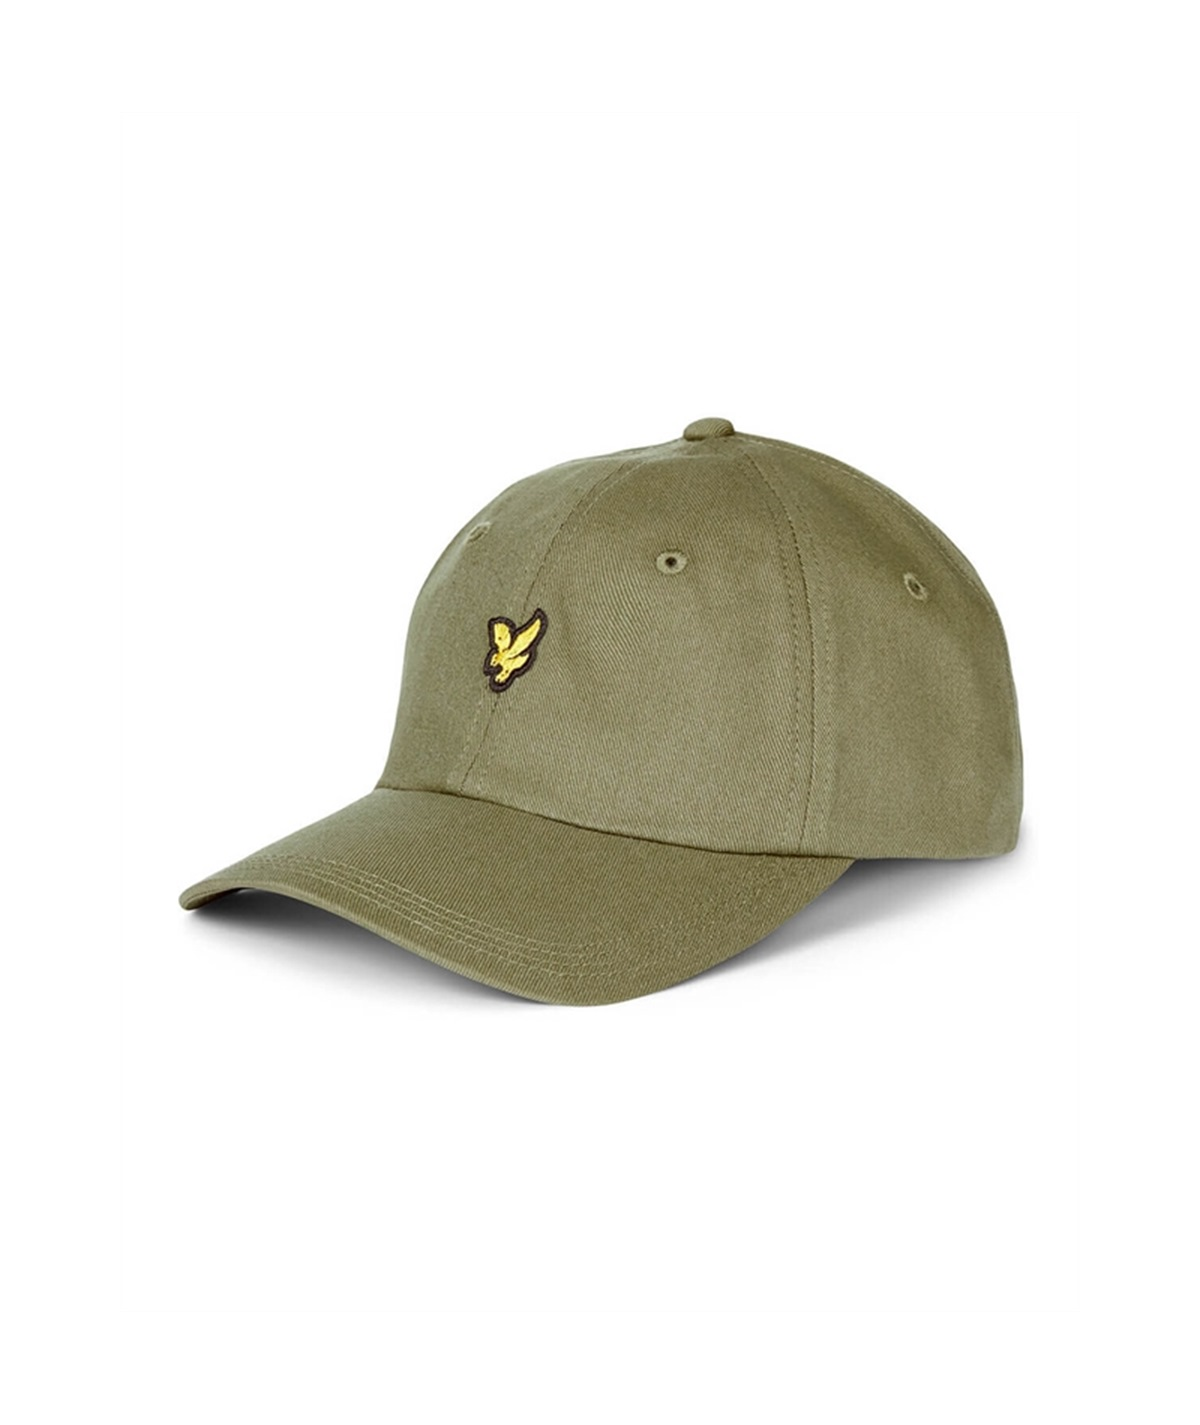 HE906A_Z801 cappello visiera baseball lyle scott casuals